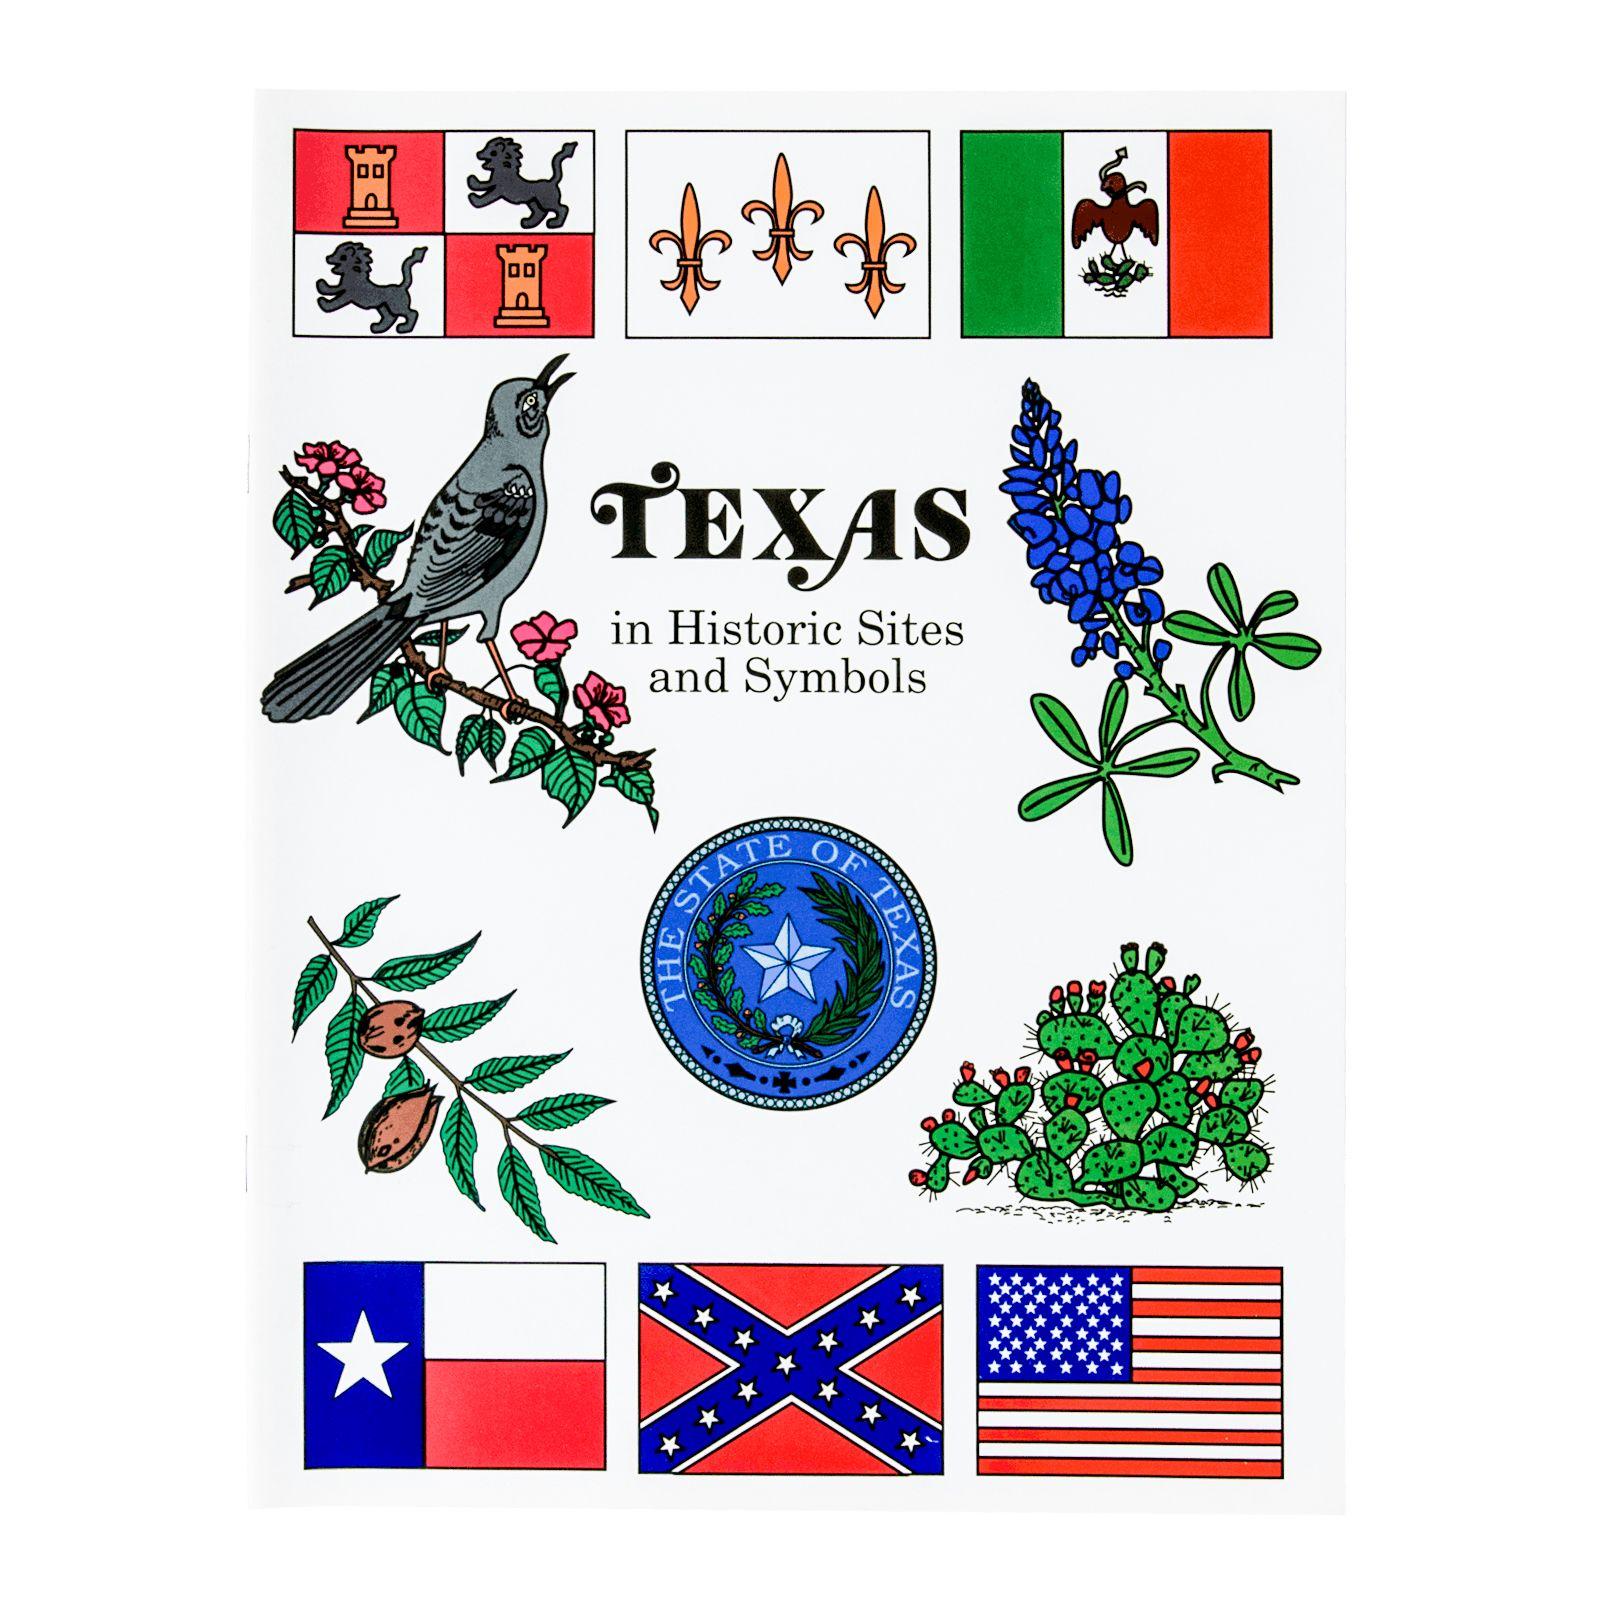 Texas Travel Symbols